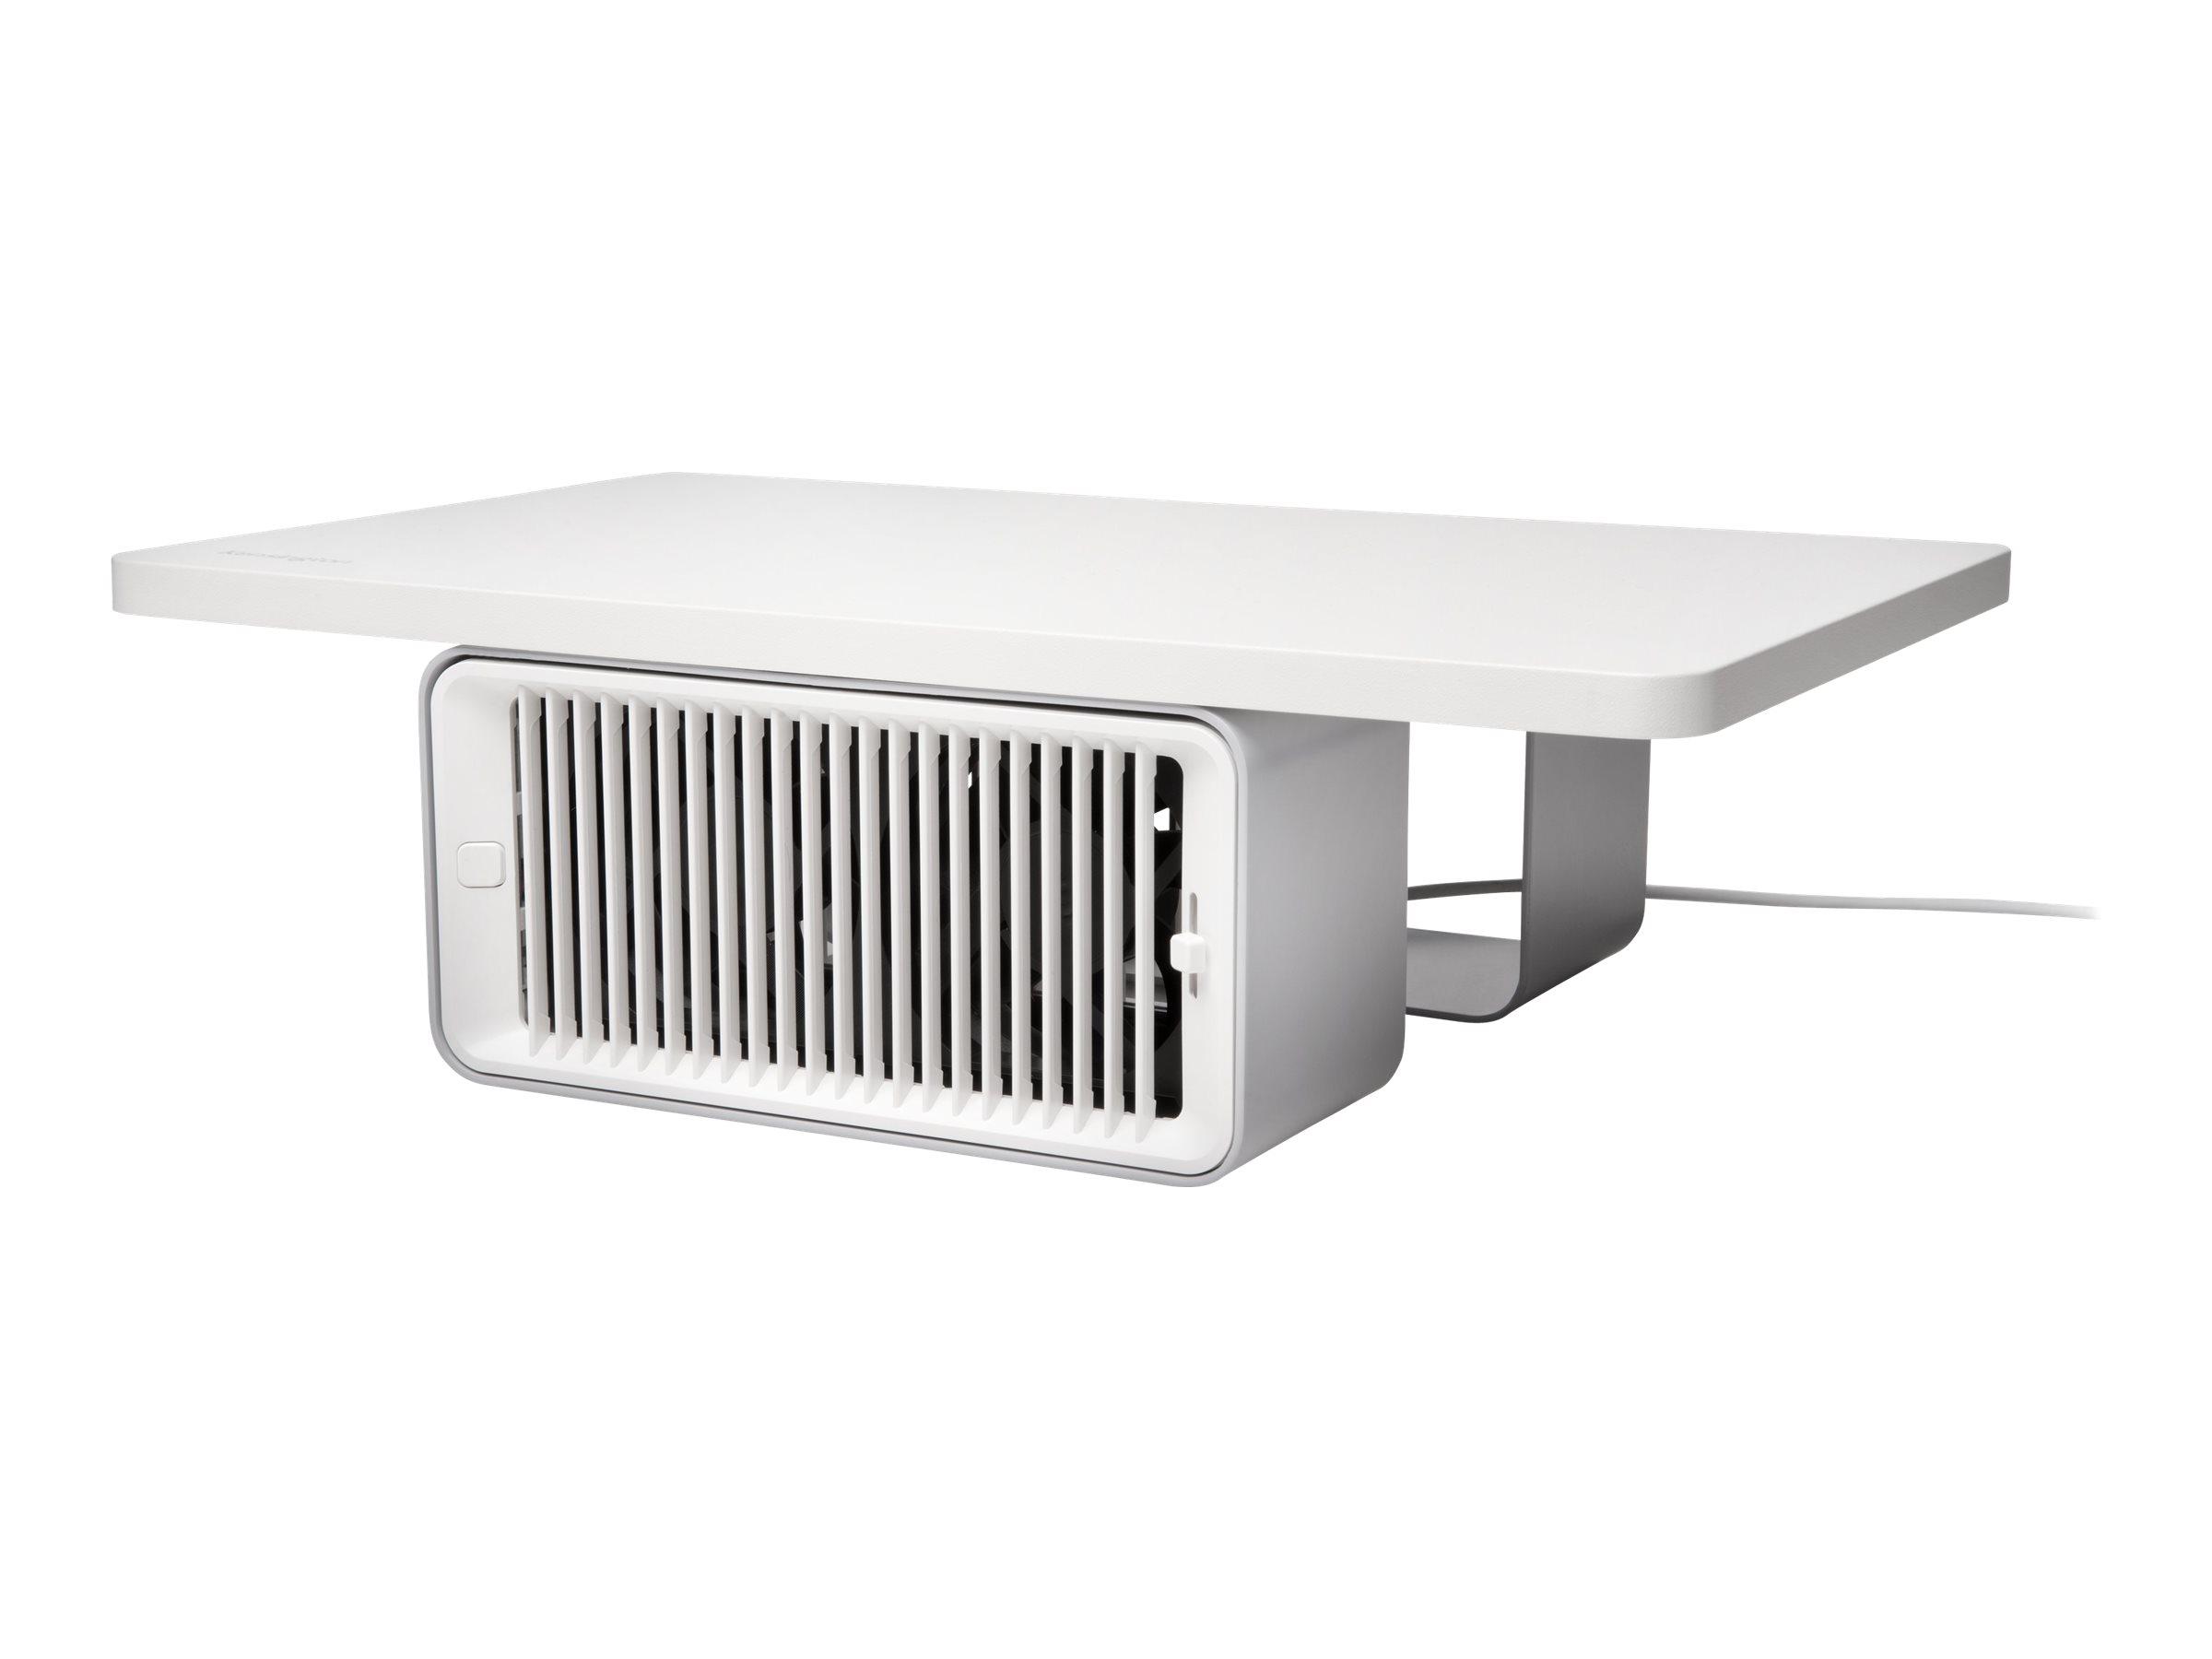 Kensington CoolView Wellness Monitor Stand with Desk Fan - Bildschirmständer